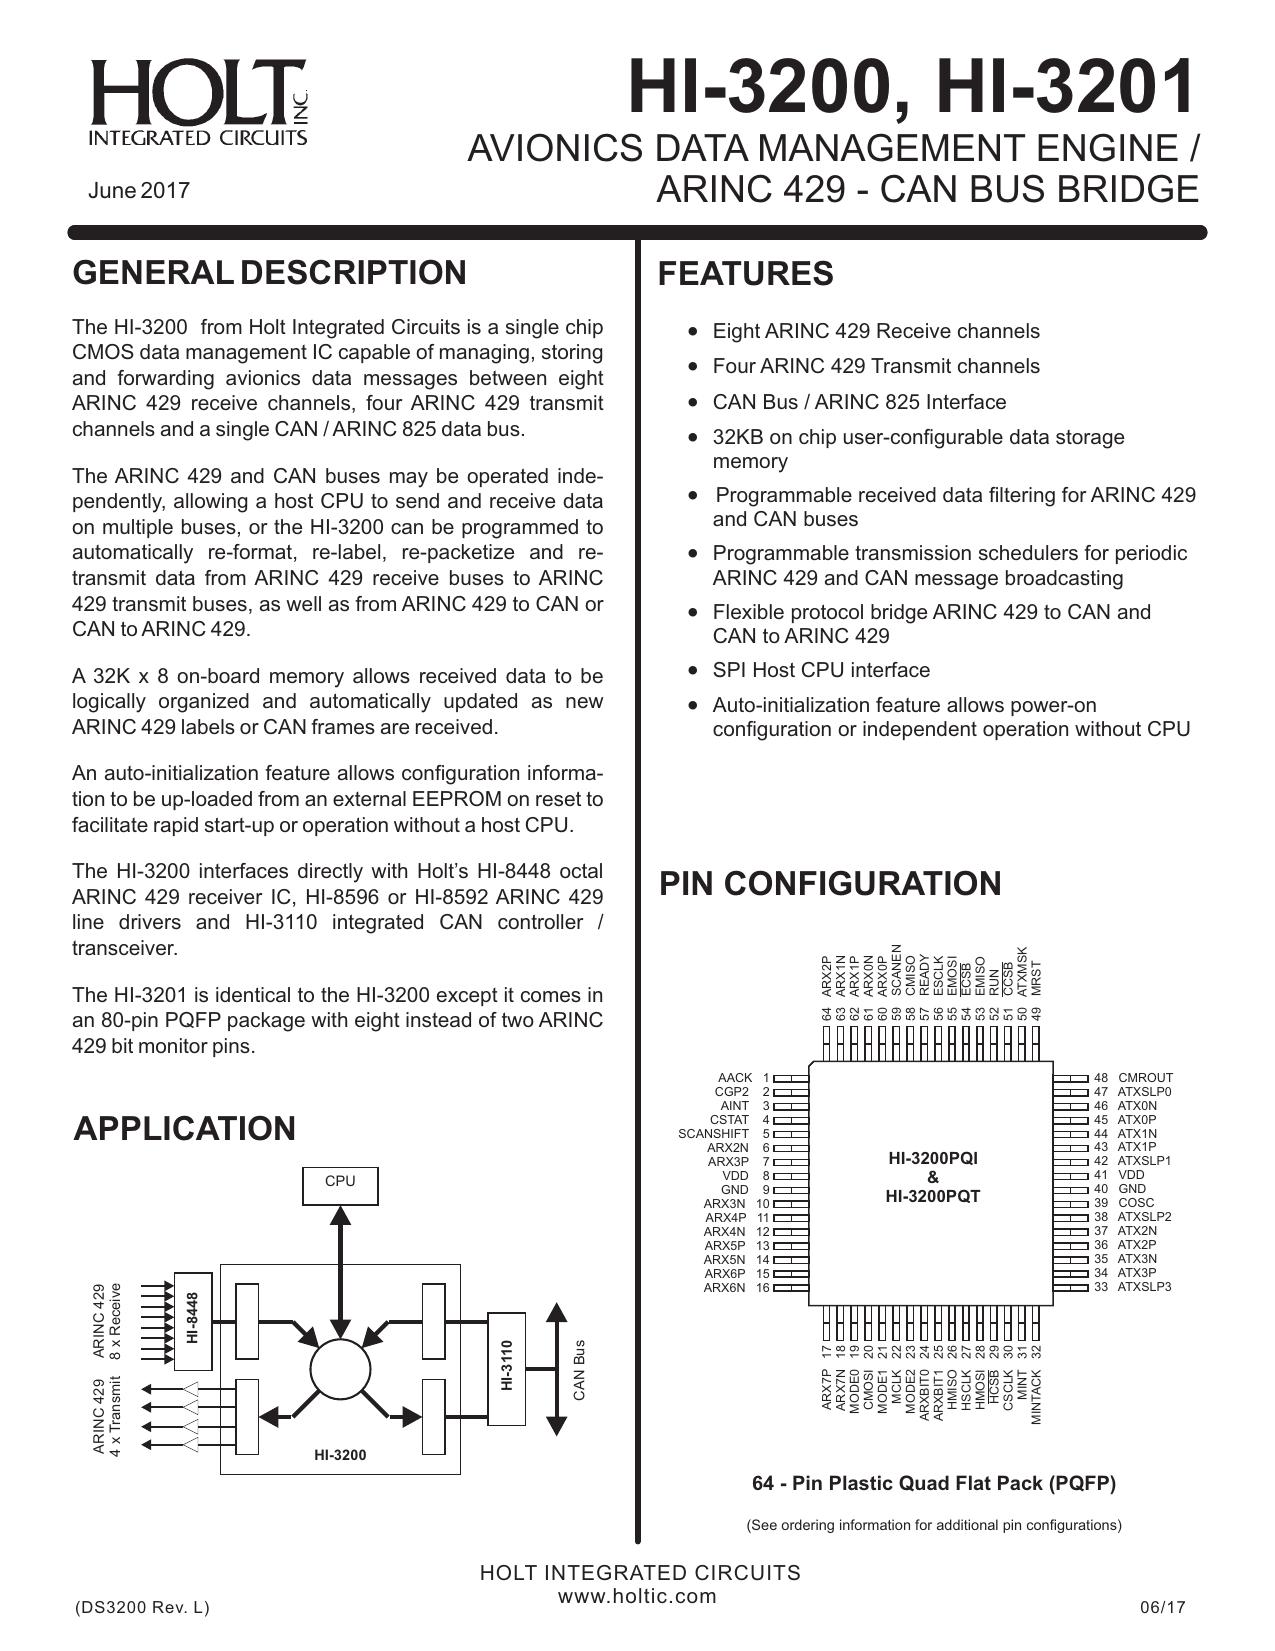 hight resolution of hi 3200 hi 3201 holt integrated circuits